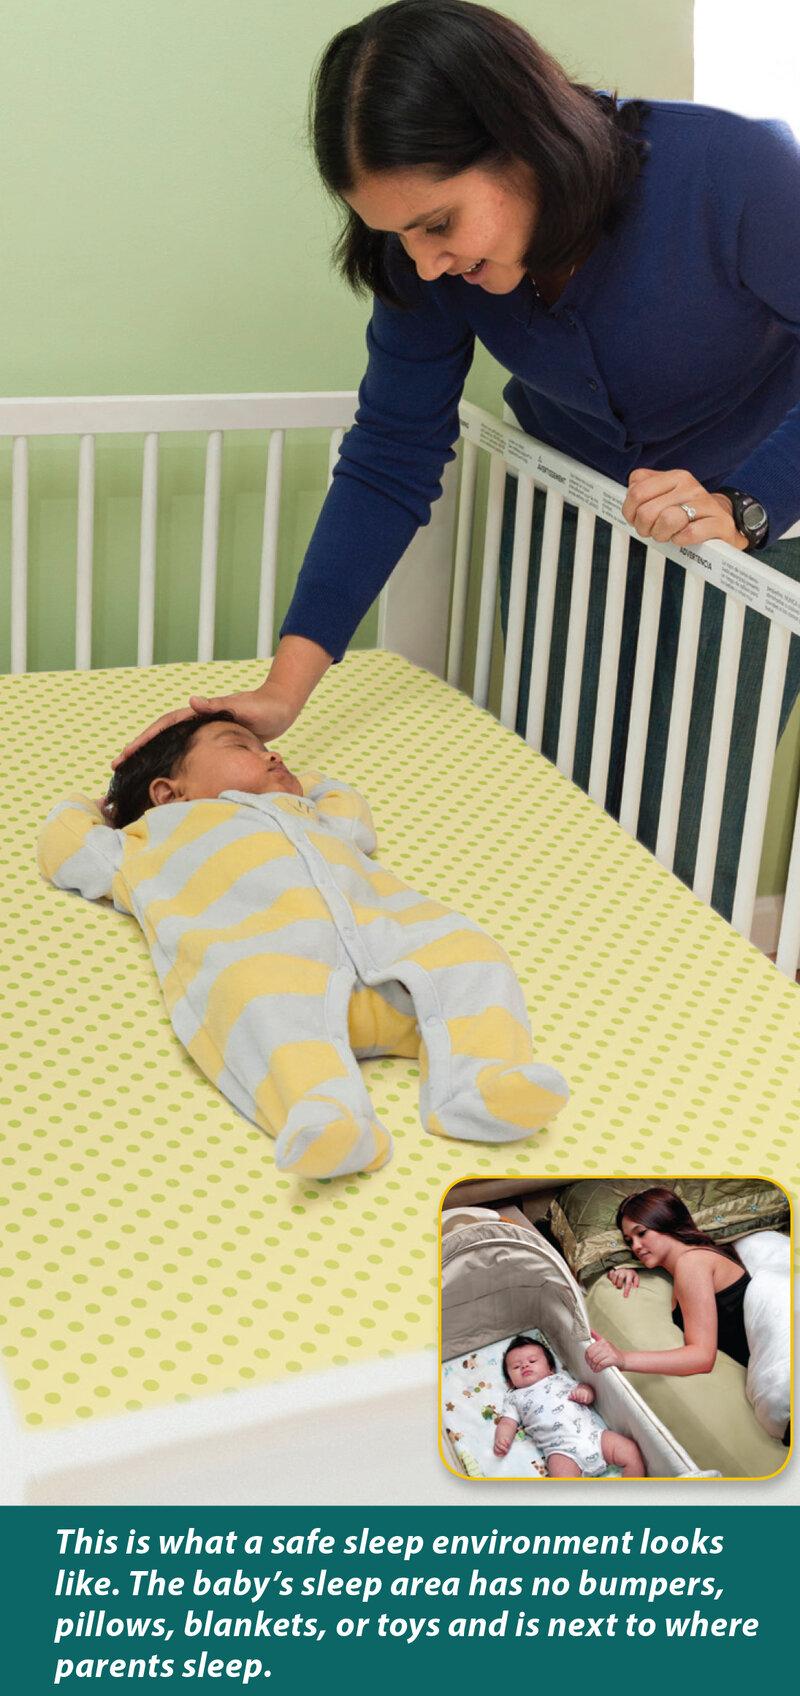 Doctors Warn That Soft Bedding Puts Babies At Risk Shots Health News Npr